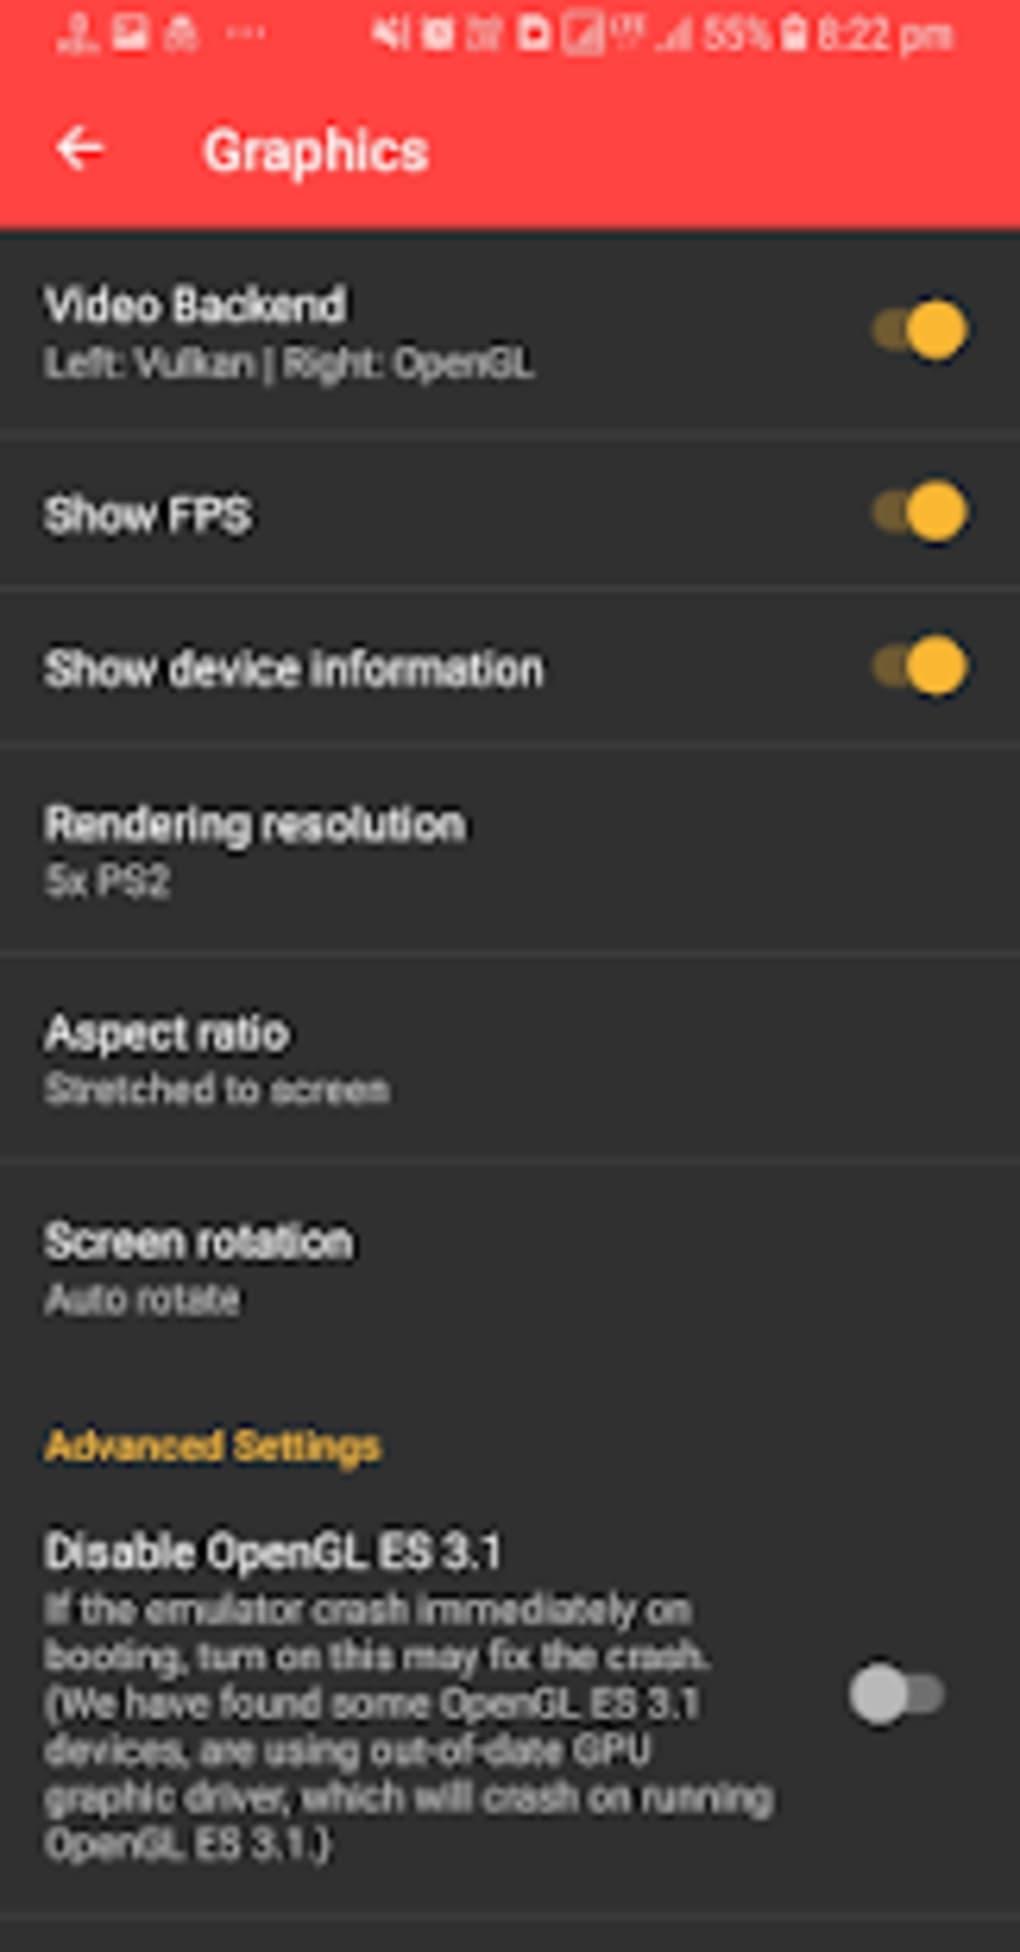 ps2 emulator iphone